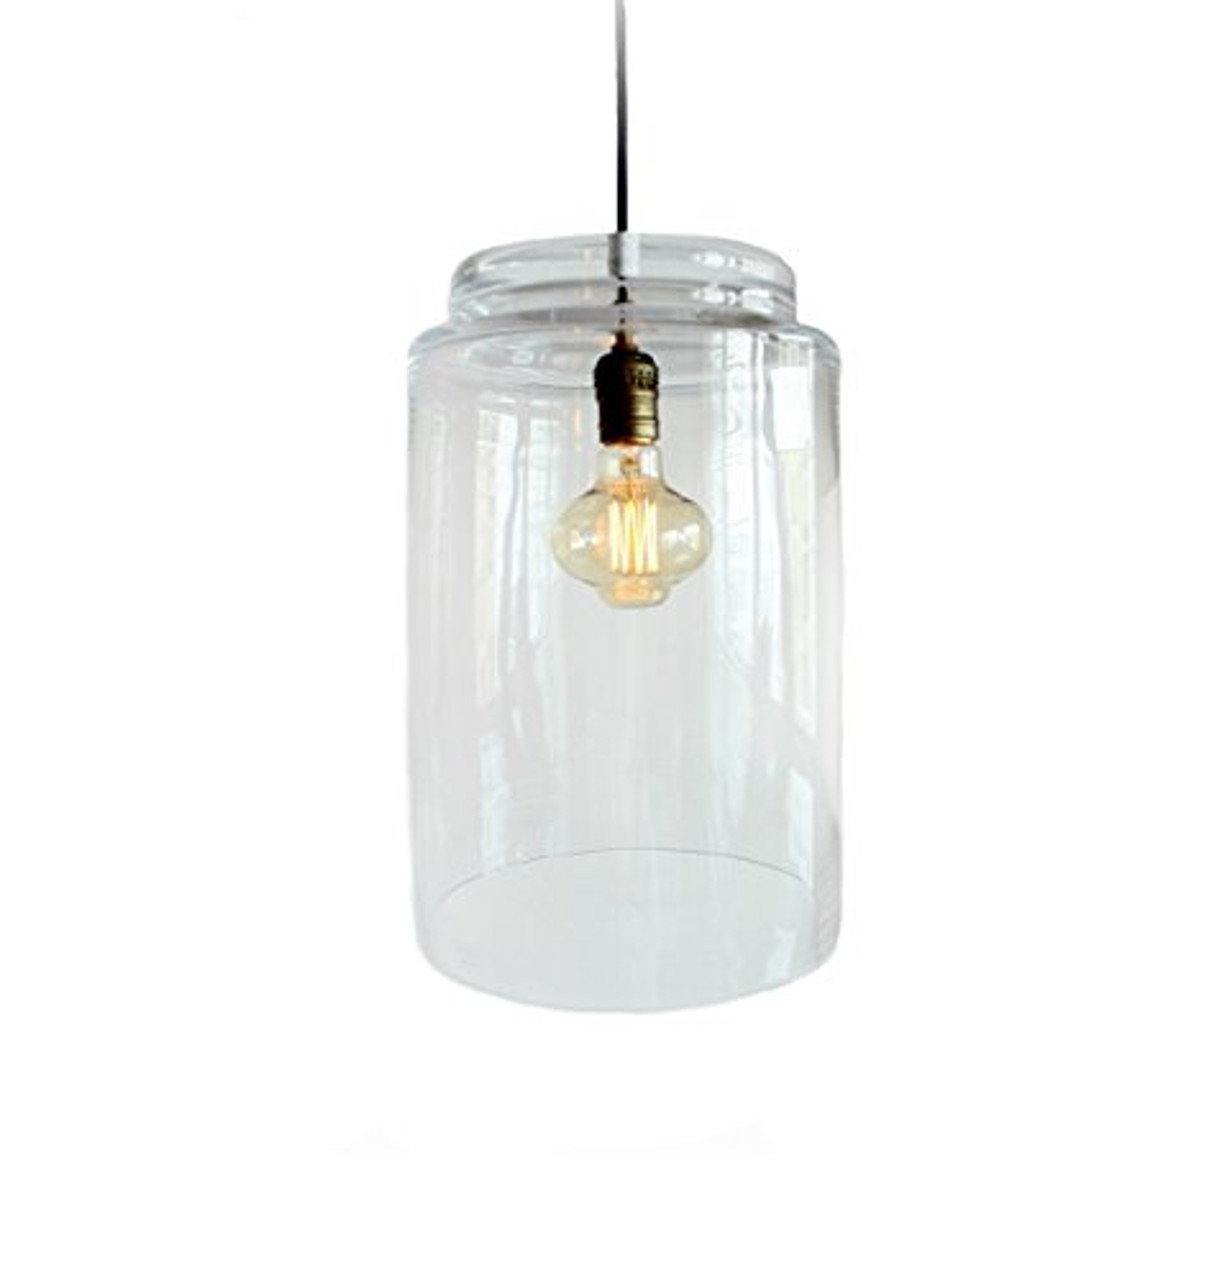 Large Glass Pendant Industrial Lighting Farmhouse Kitchen Island Bar Drop Light Hanging Hurricane Pendent Lighting Bronze Edison Bulb Chandelier